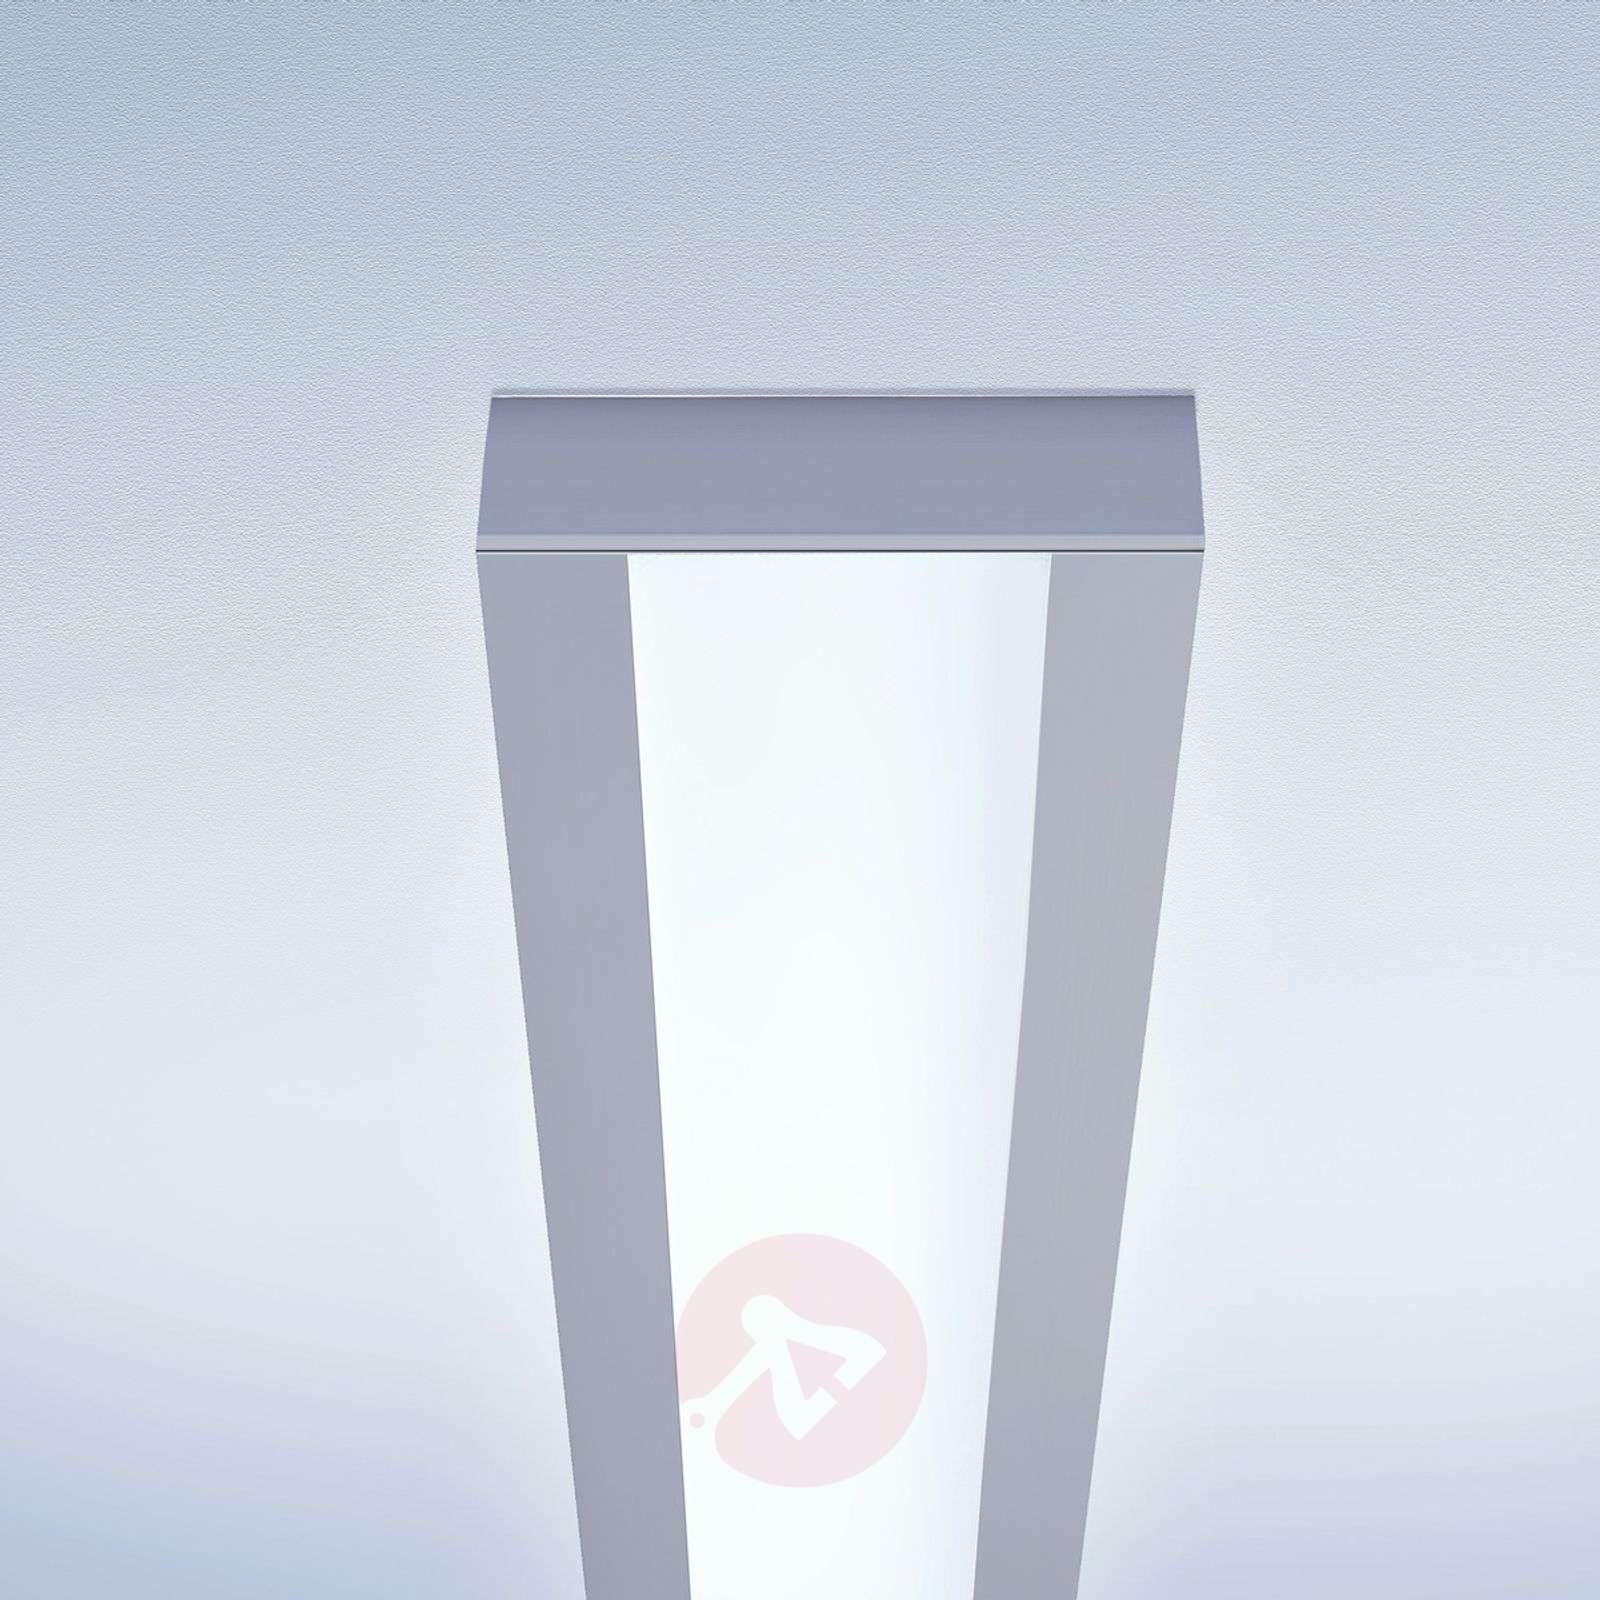 Pinta-asennus-LED-kattovalaisin Vison-A2-6033508X-01